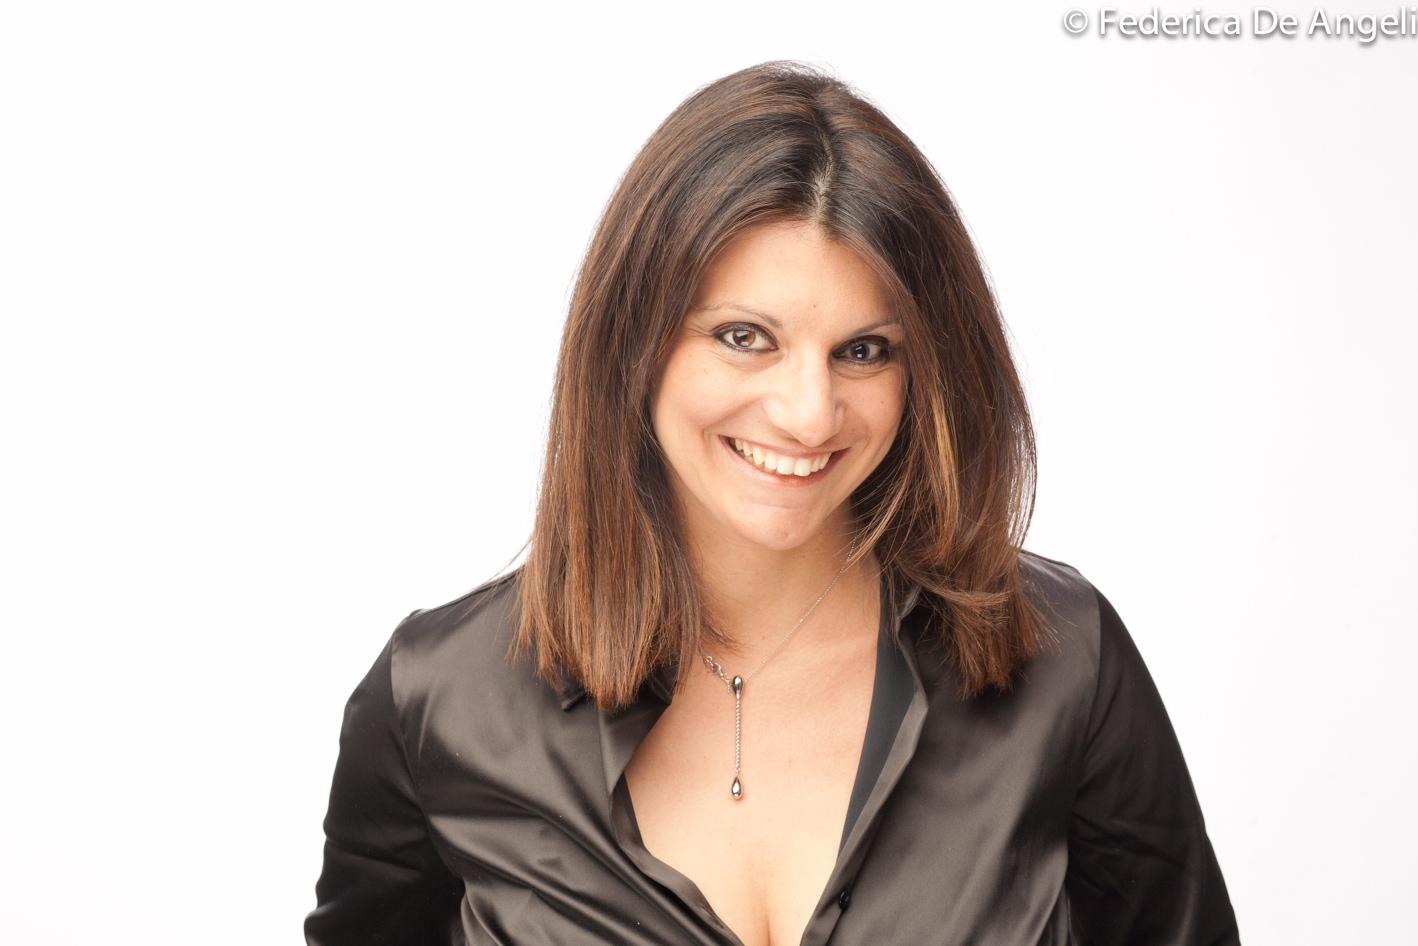 Paola Servente